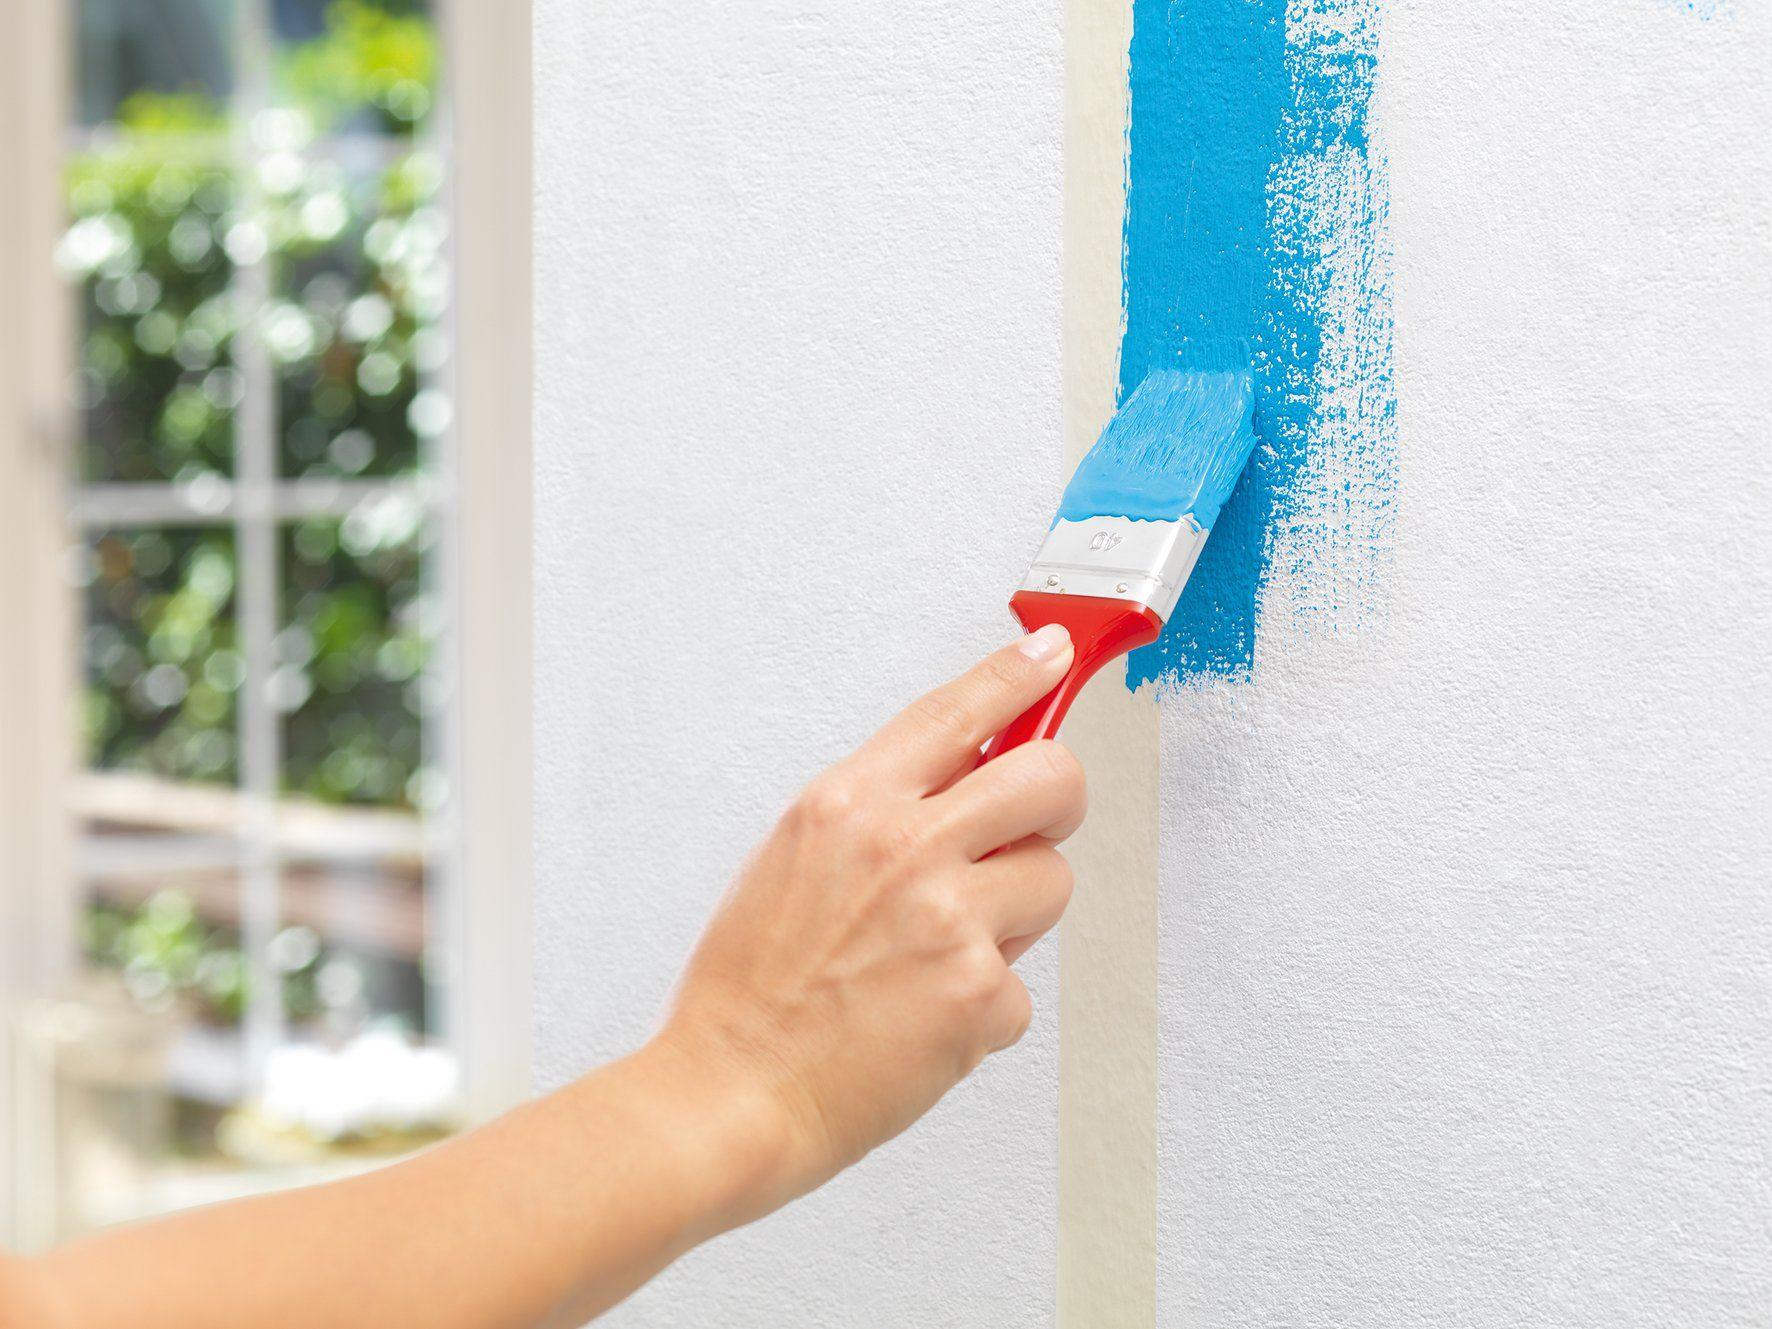 Tesa Masking Tape Perfect For Sharp Edges 50 M X 19 Mm Ad Tape Sponsored Perfect Tesa Masking Painting Edges Masking Tape Things To Sell